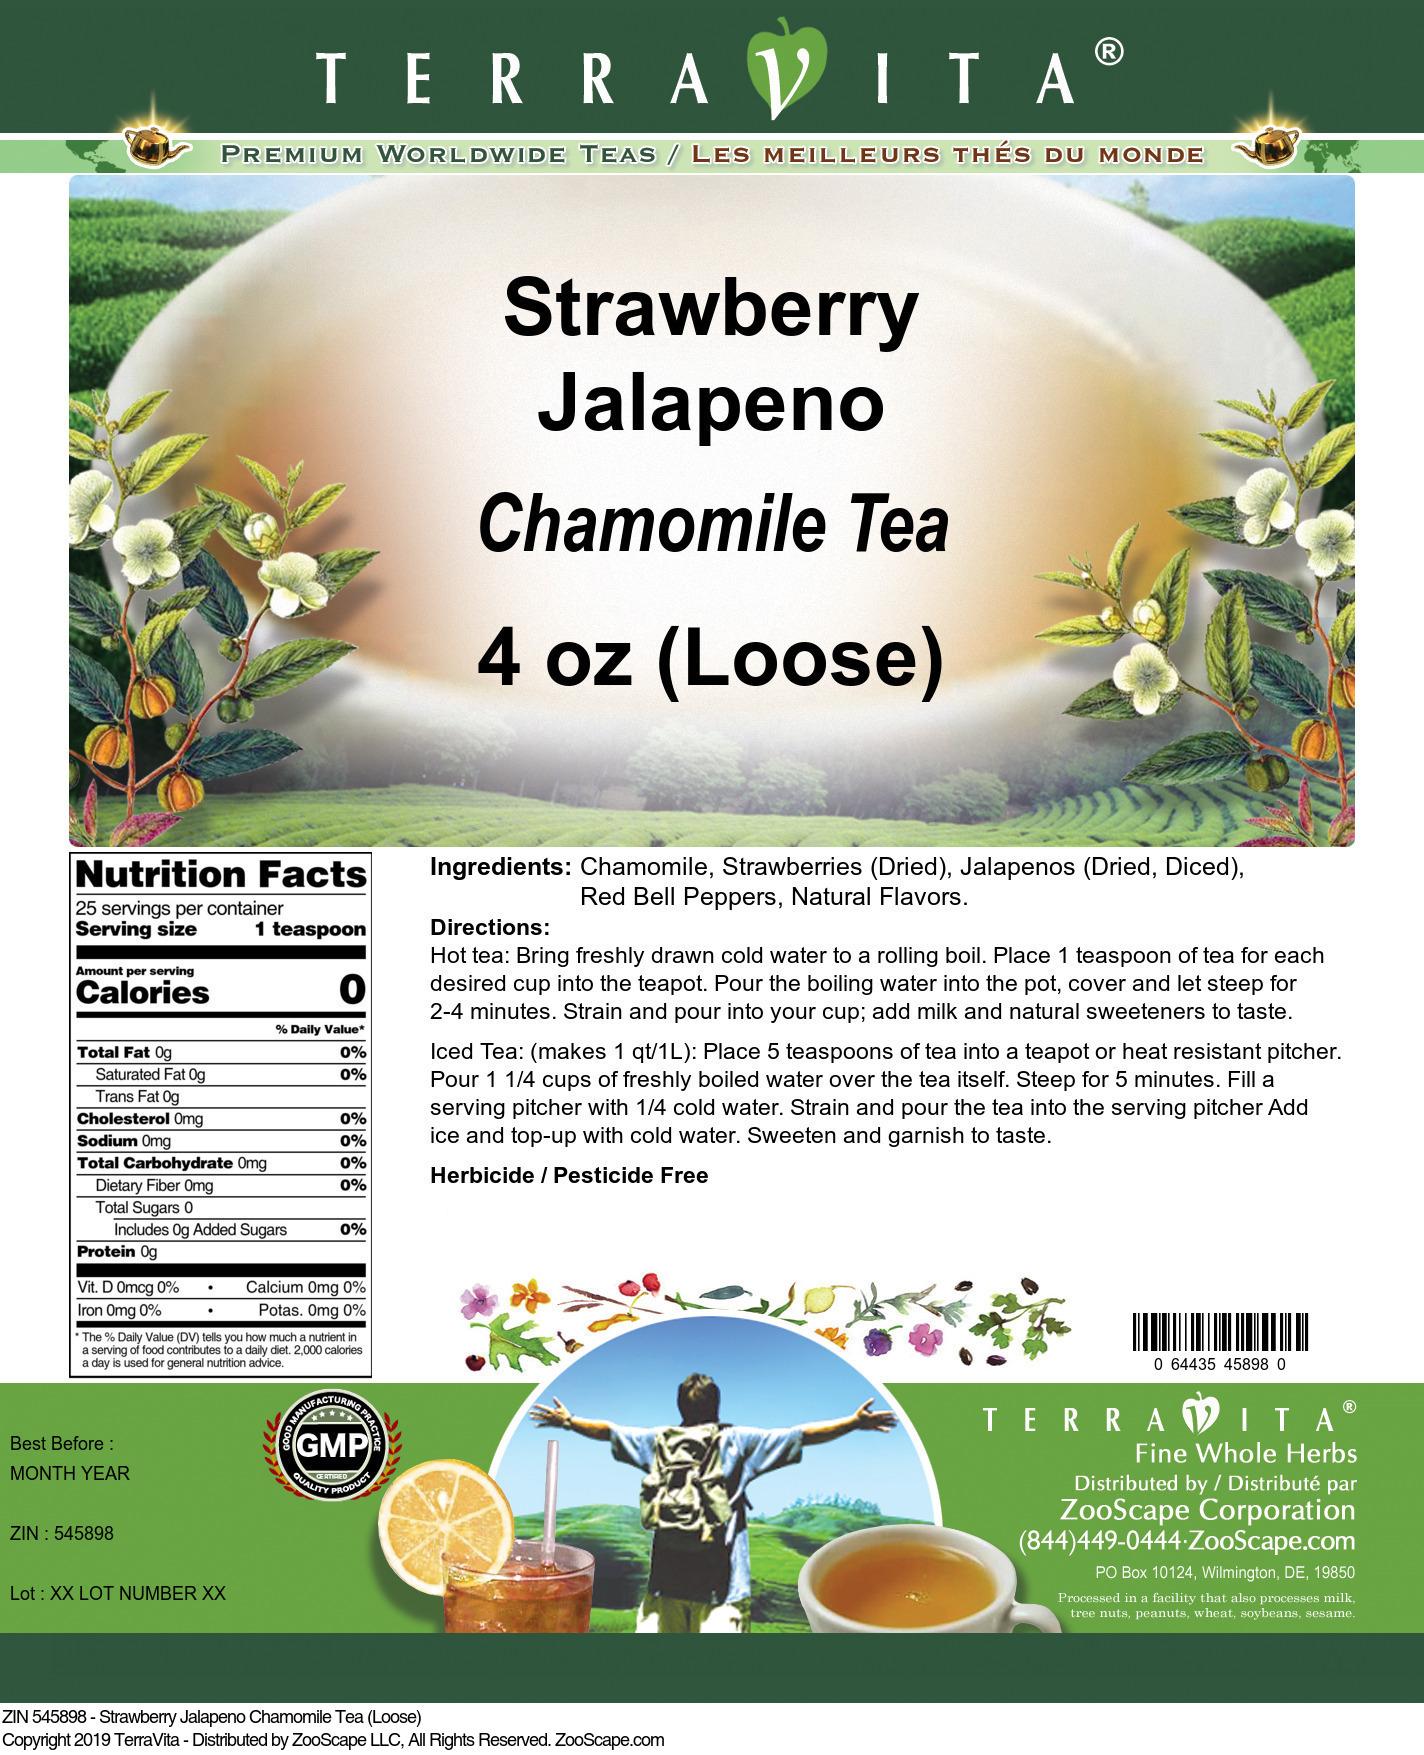 Strawberry Jalapeno Chamomile Tea